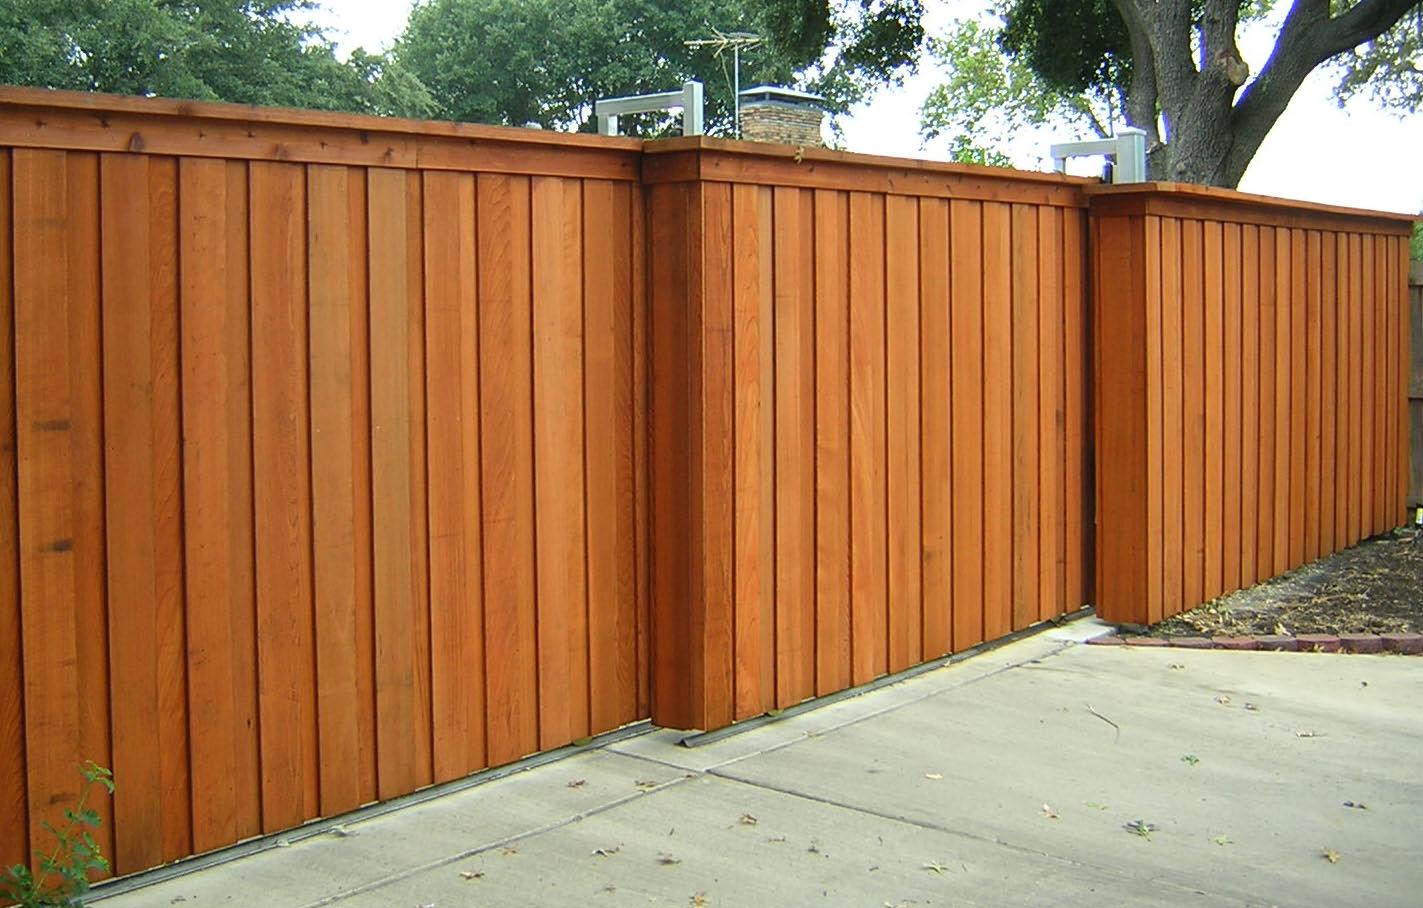 15.SIMPHOME.COM stylish pine wood unpolished stockade backyard fence ideas